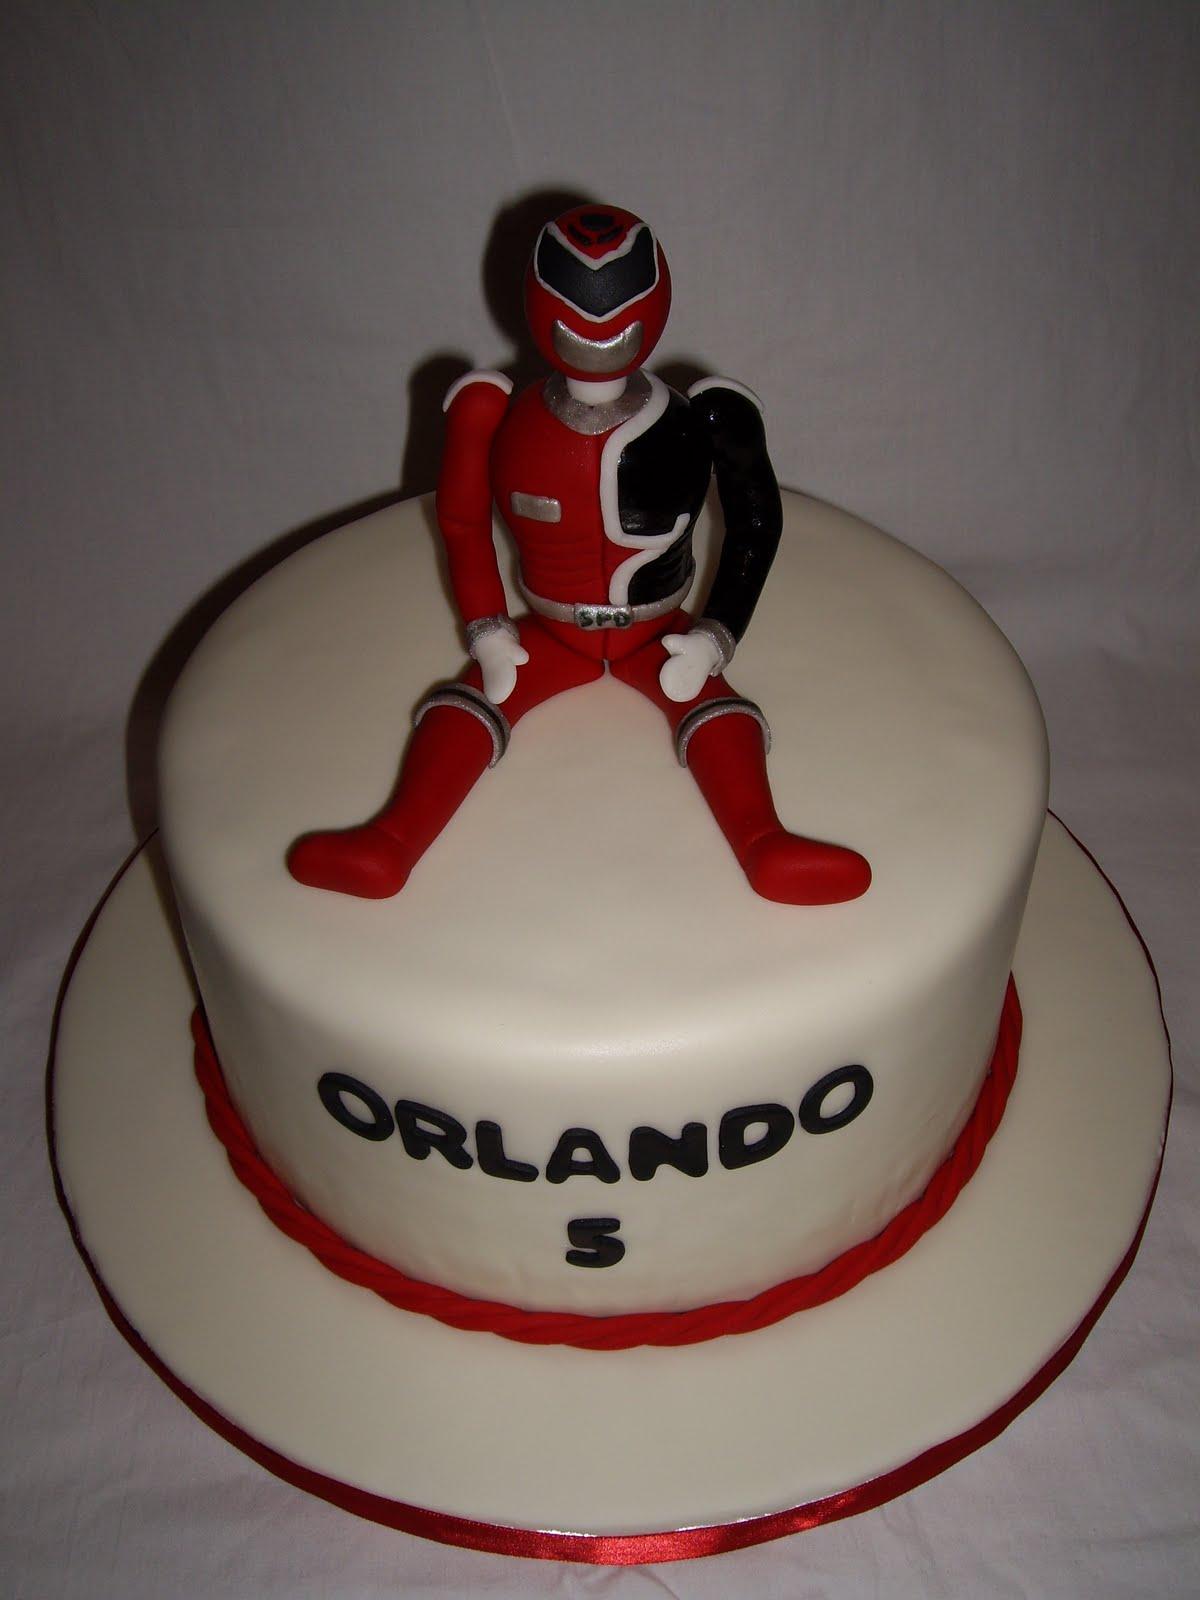 Darcie S Custom Cakes